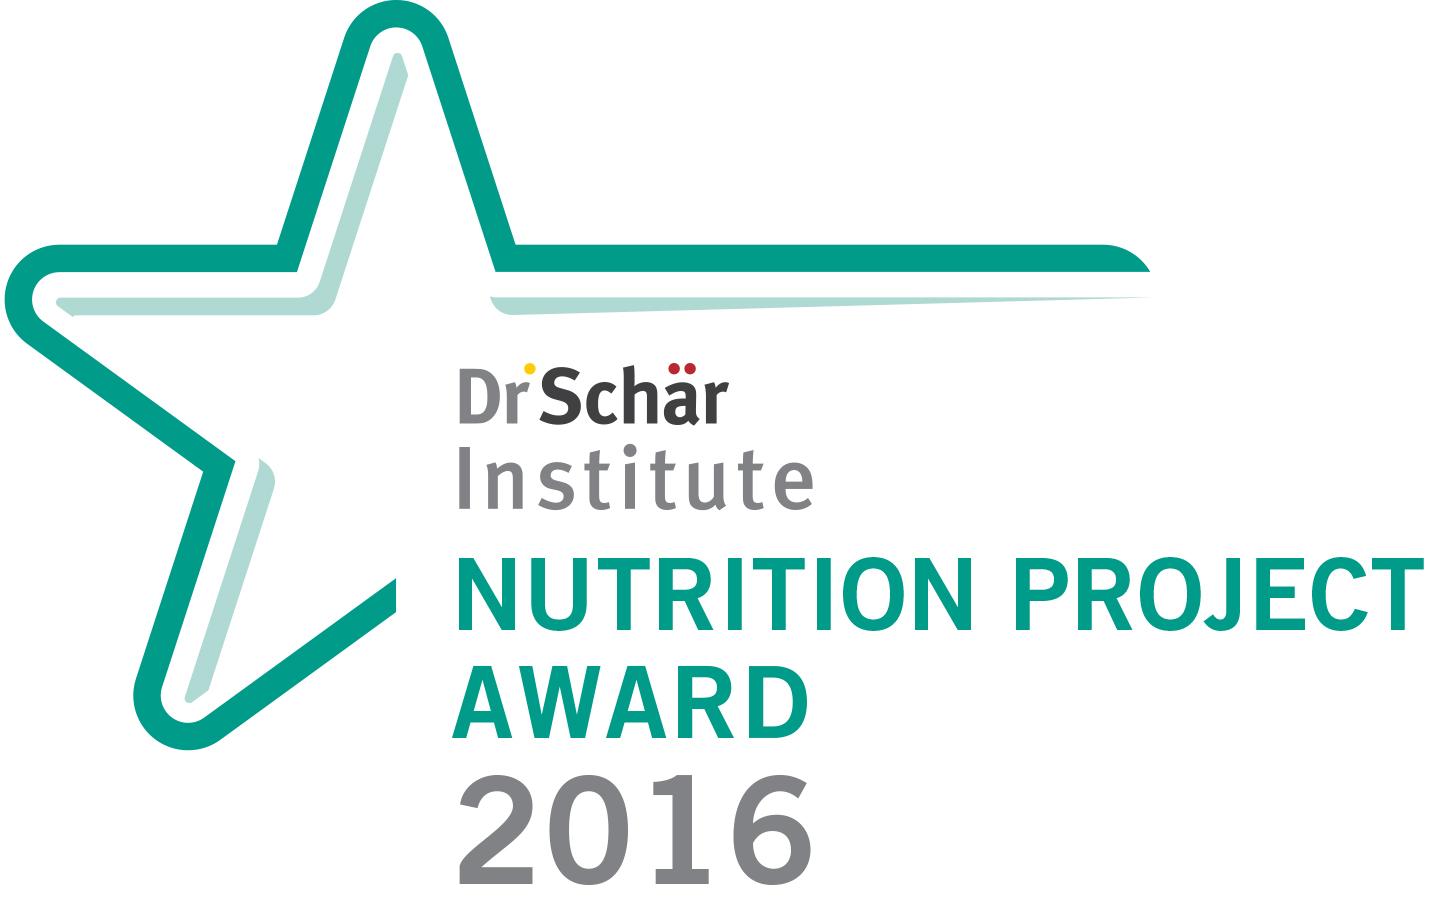 Logo des Dr. Schär Institute Nutrition Project Award